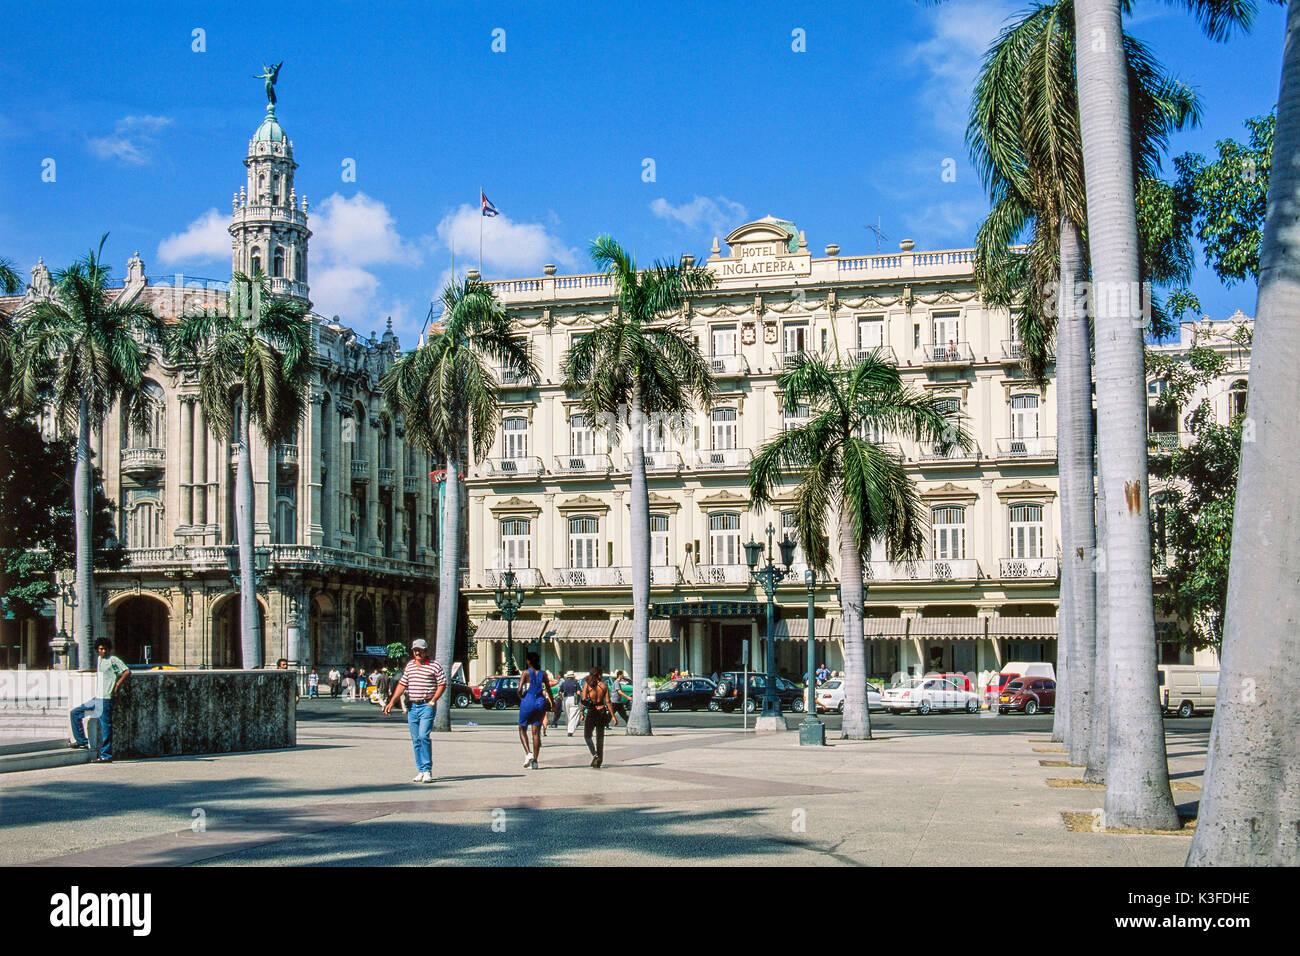 Hotel of Inglaterra at the centre of Havana, Cuba - Stock Image